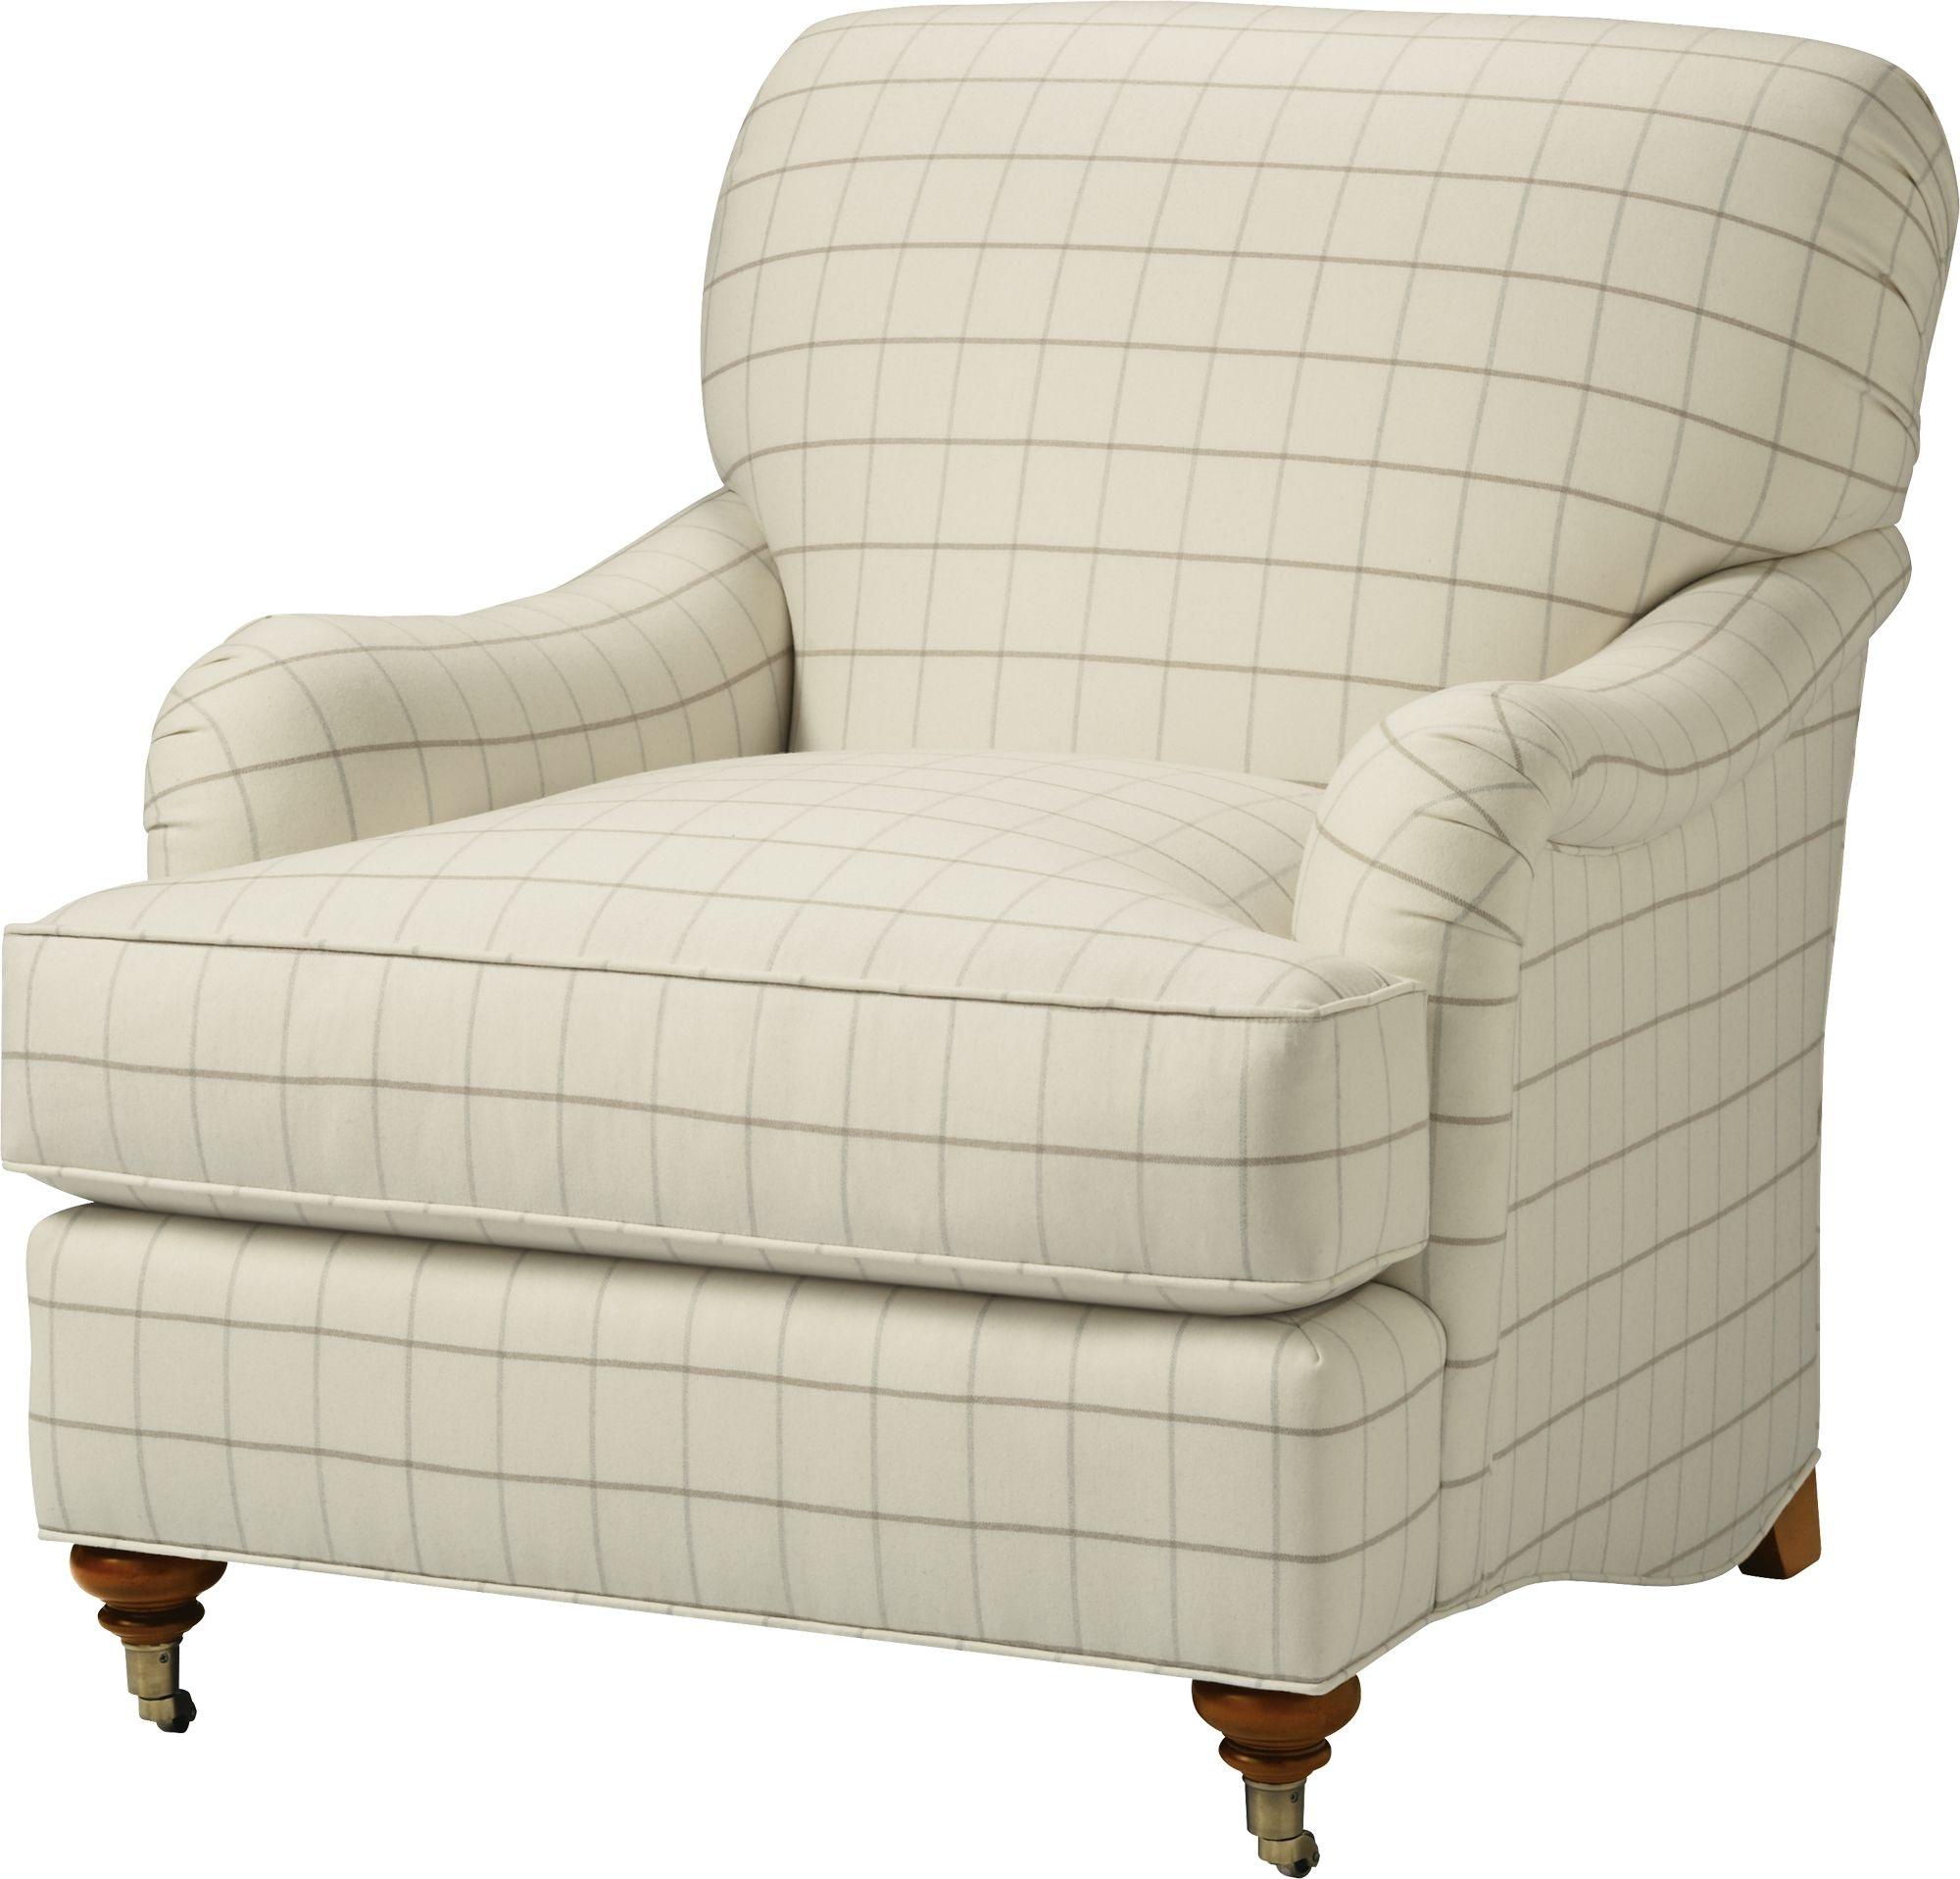 Baker Furniture Baker Elements Baker Elements Chair E00 4